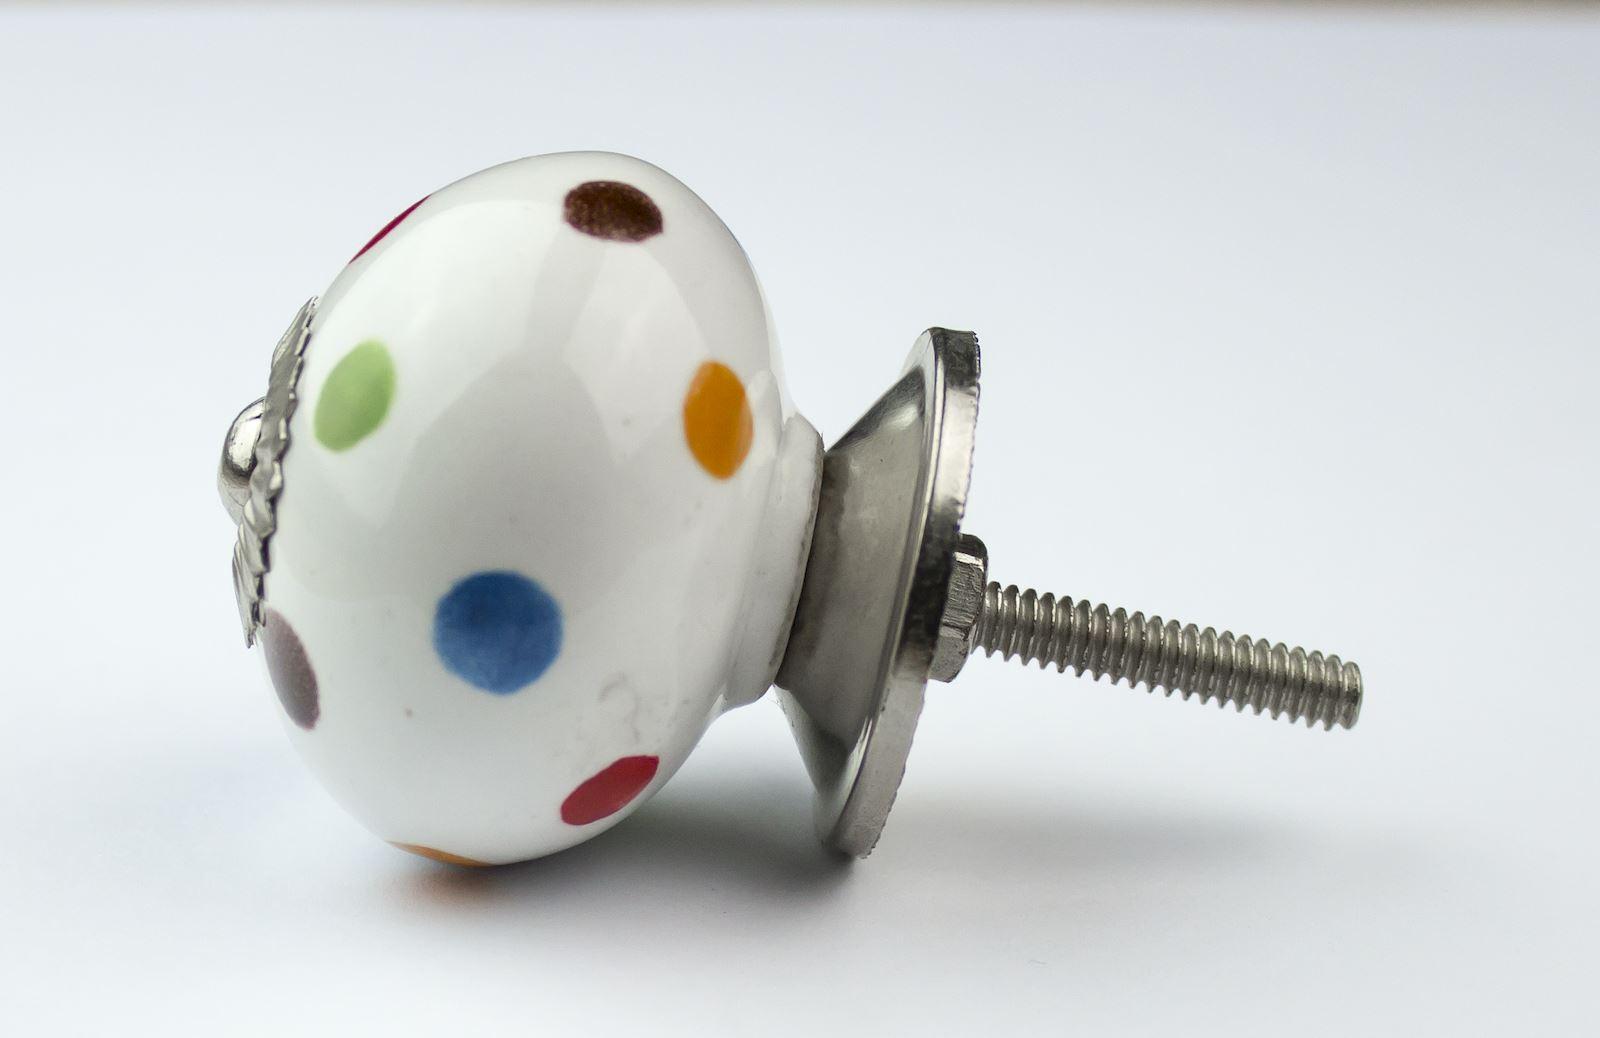 Dots-amp-Stripes-Ceramic-Door-Knobs-Handles-Furniture-Drawer-Pulls-Cupboard miniatura 27